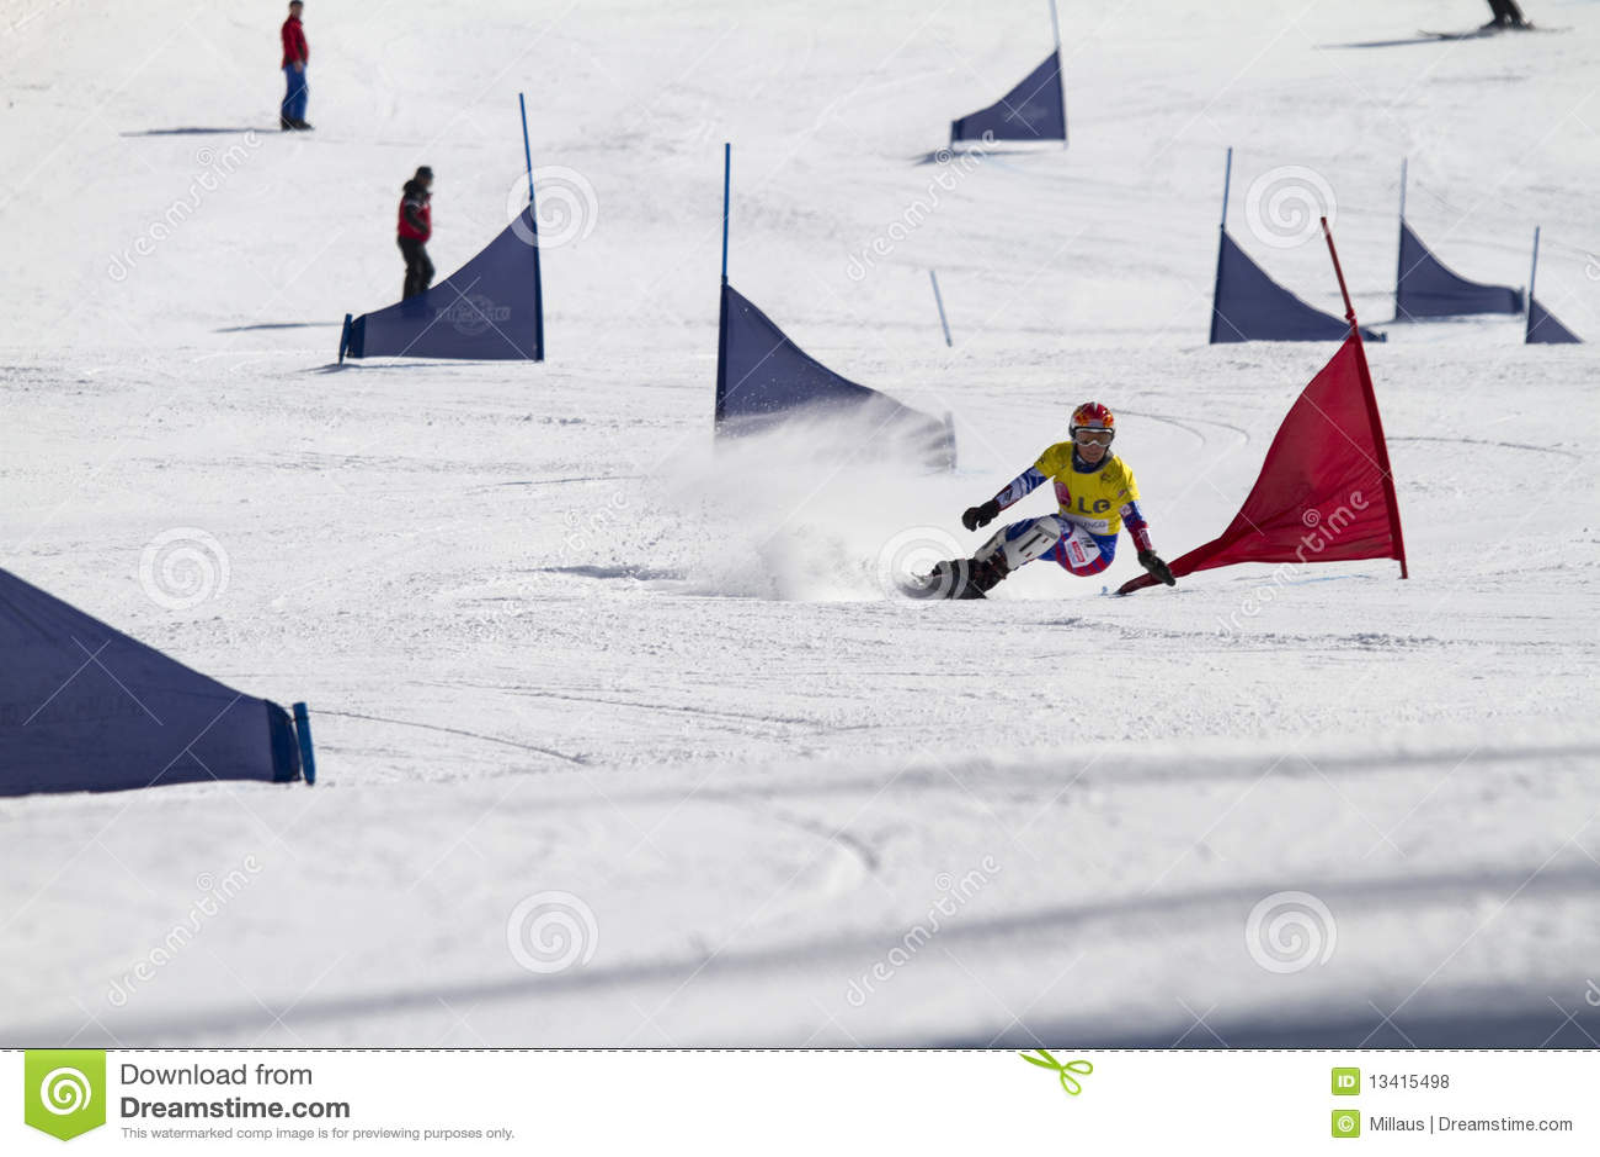 Parallel slalom snowboarding